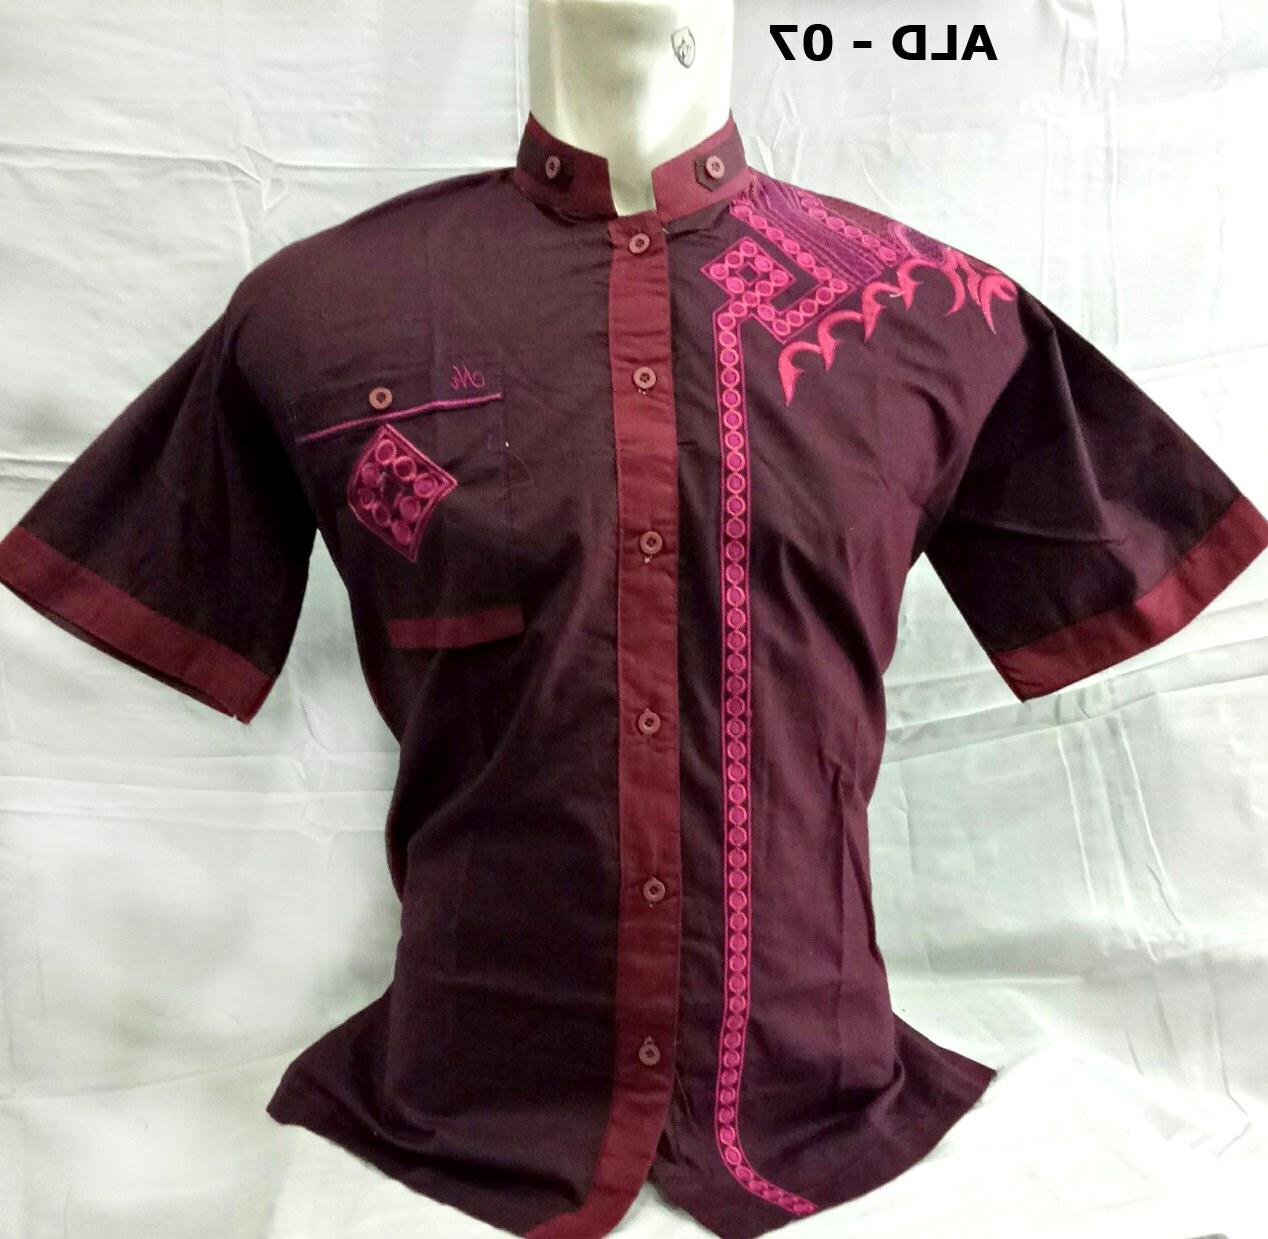 Inspirasi Model Baju Lebaran 2018 Terbaru Tqd3 Model Baju Koko Lebaran 2018 Terbaru Dan Harganya Murah